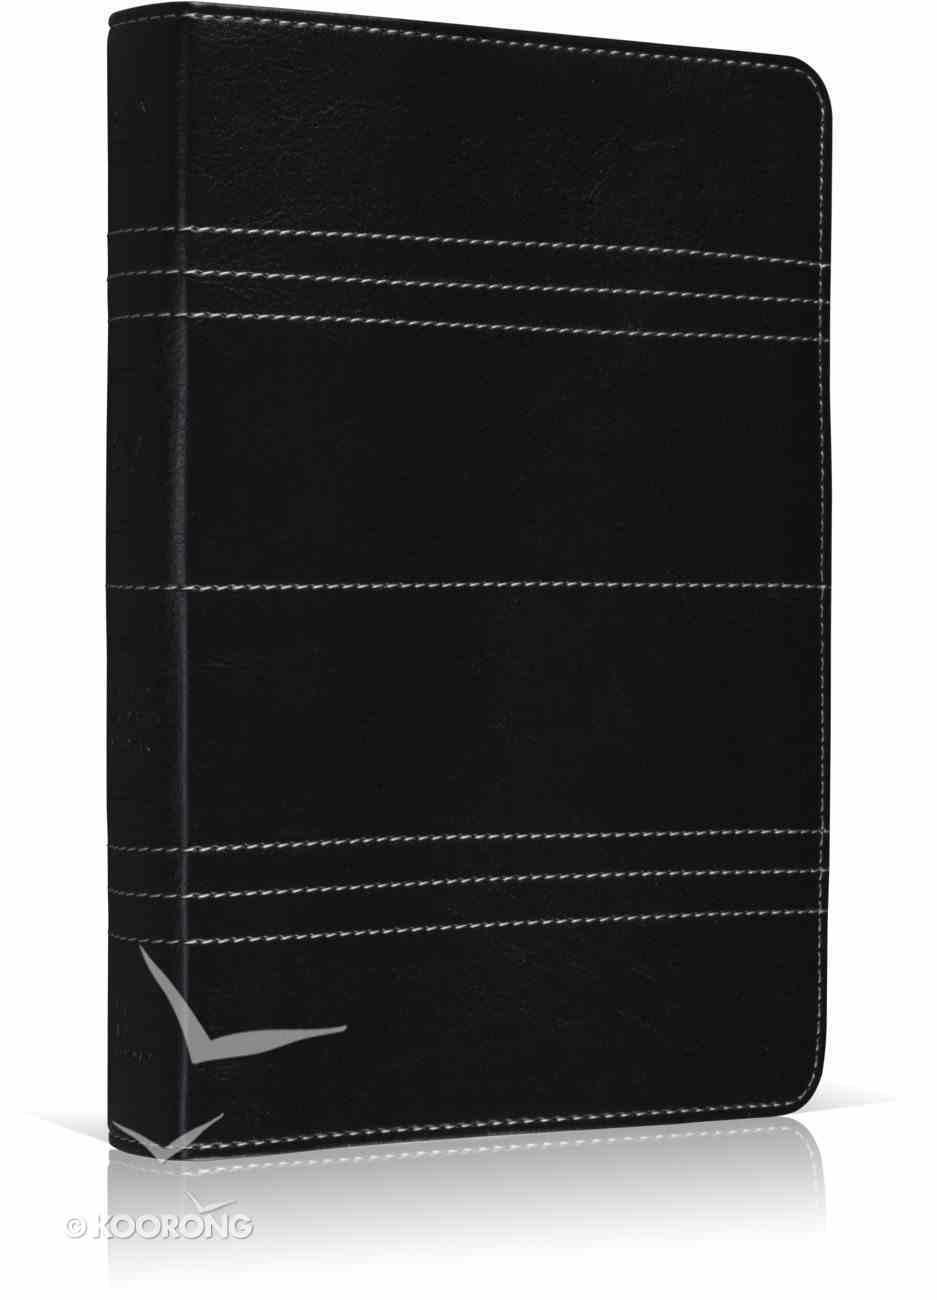 ESV Personal Size Reference Bible Trutone Graphite Stitch Design Imitation Leather